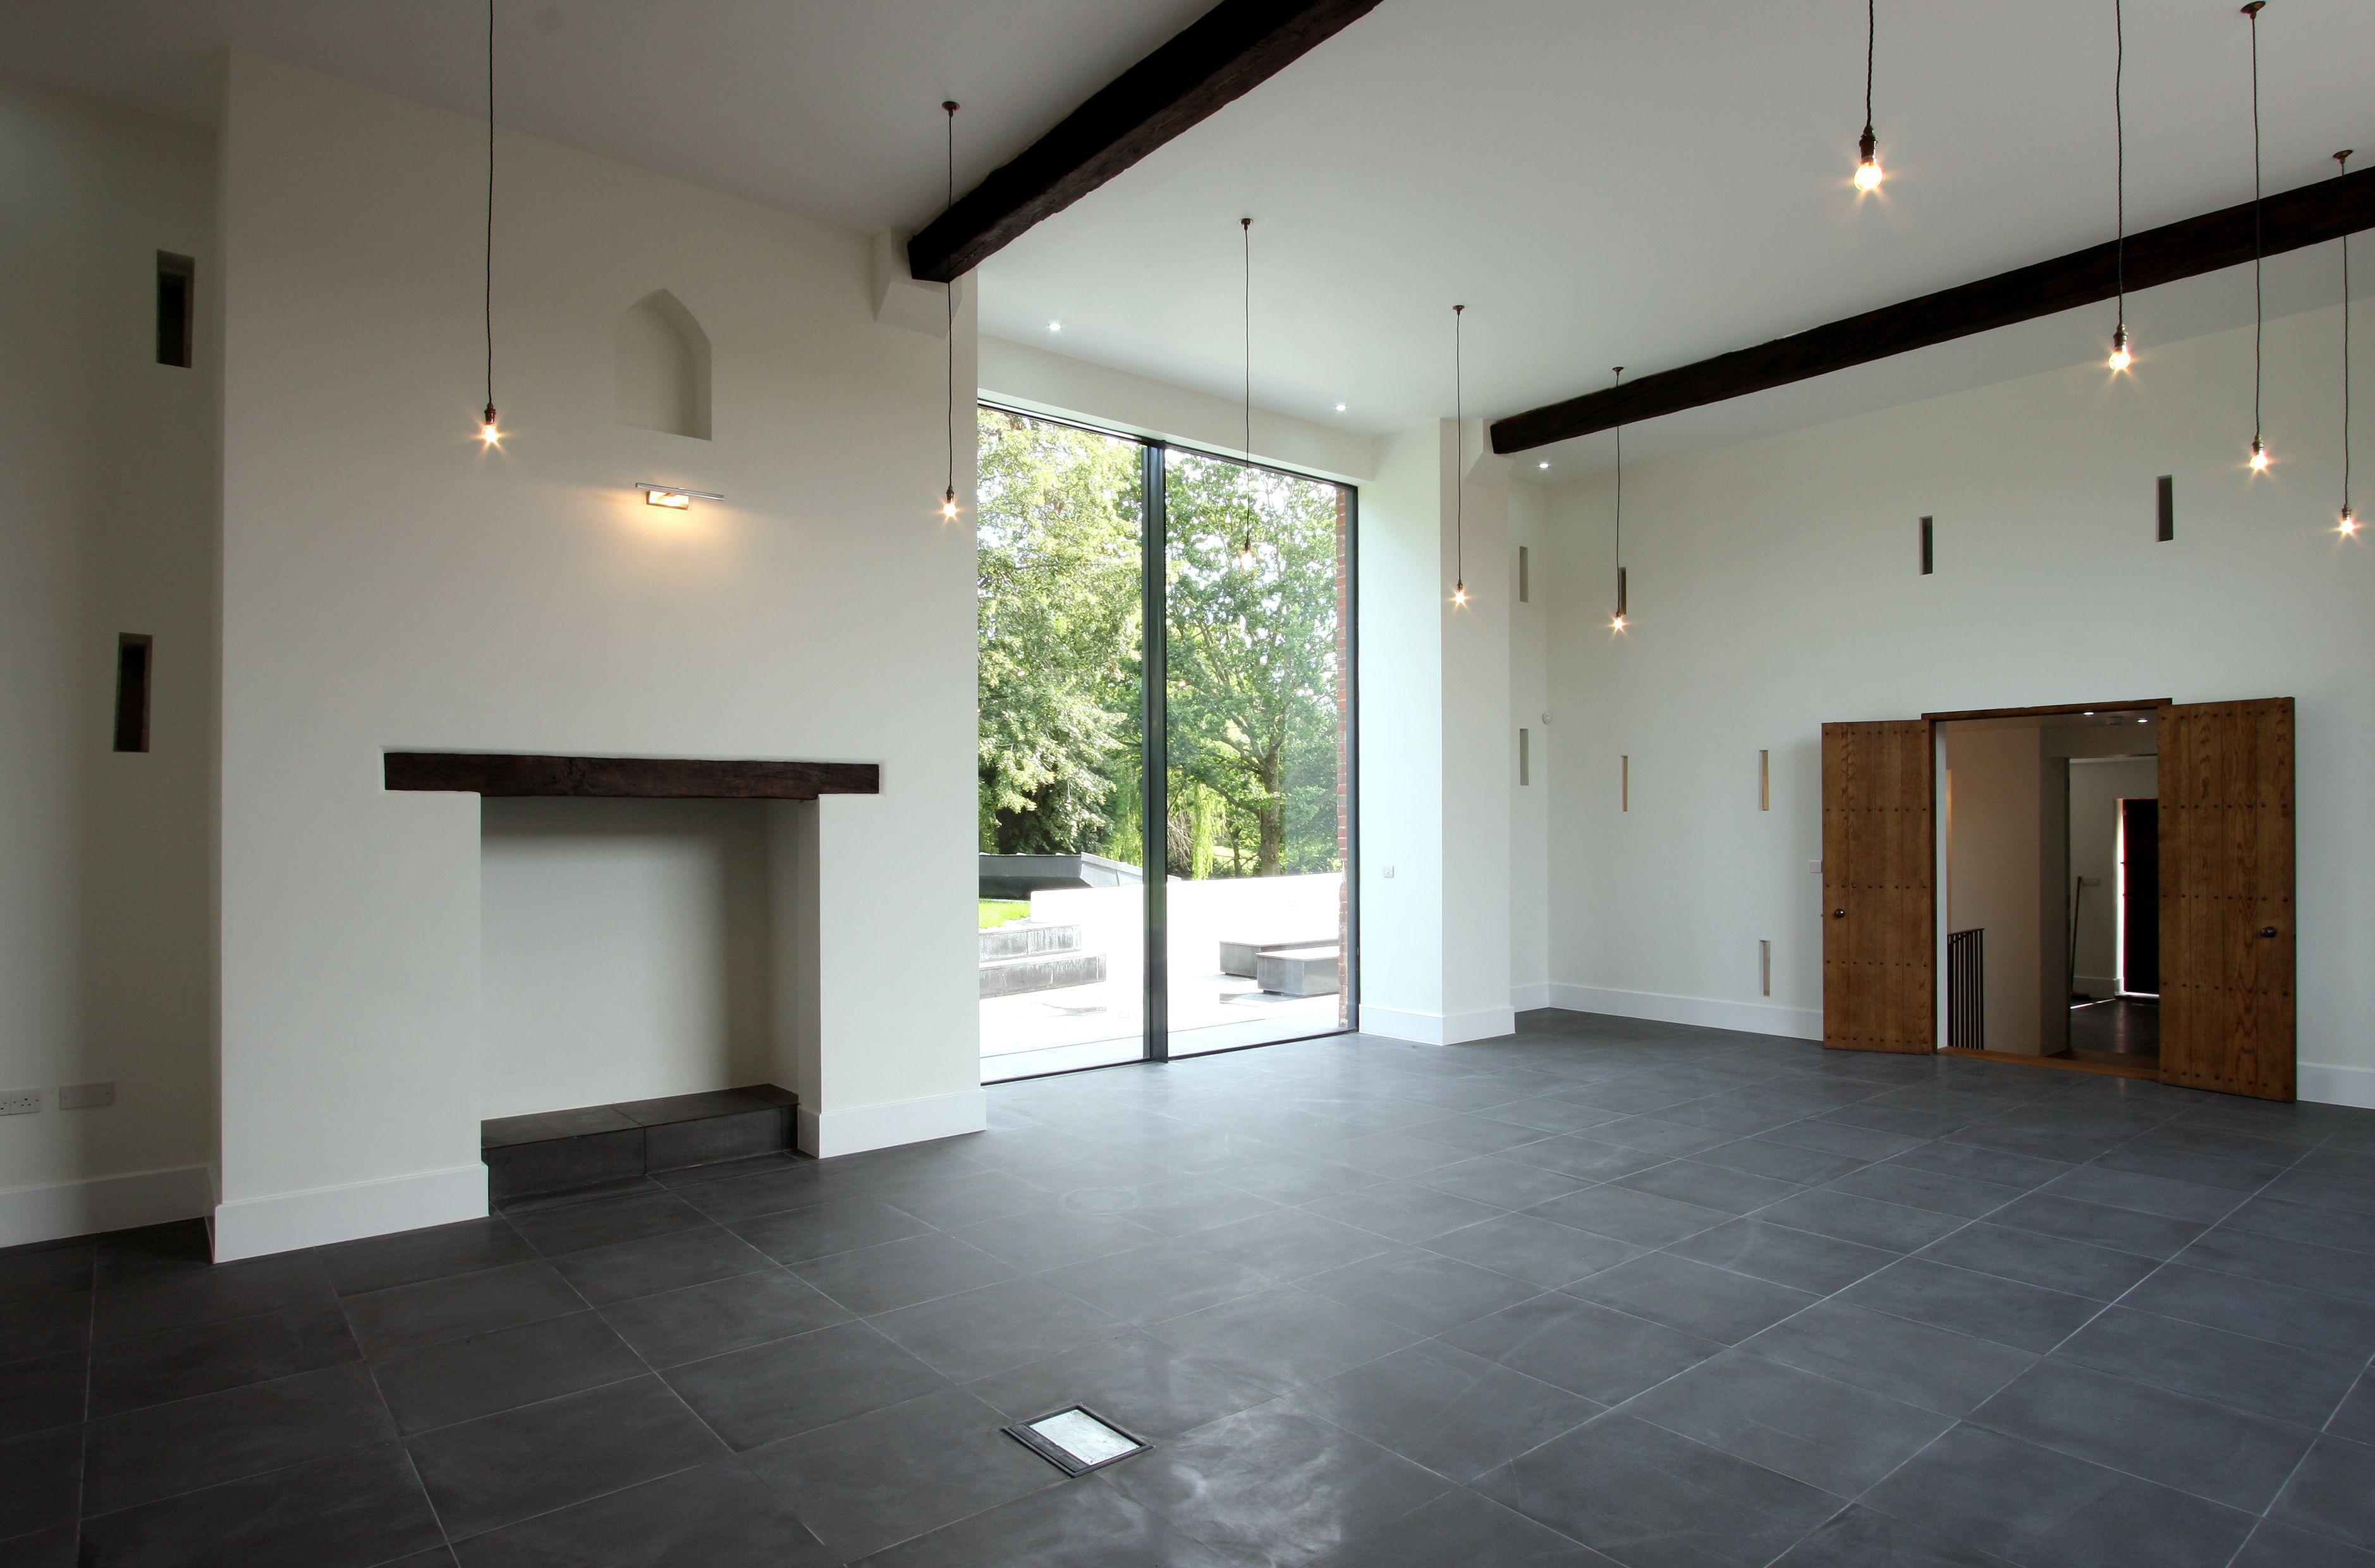 4m high, floor to ceiling height minimal windows